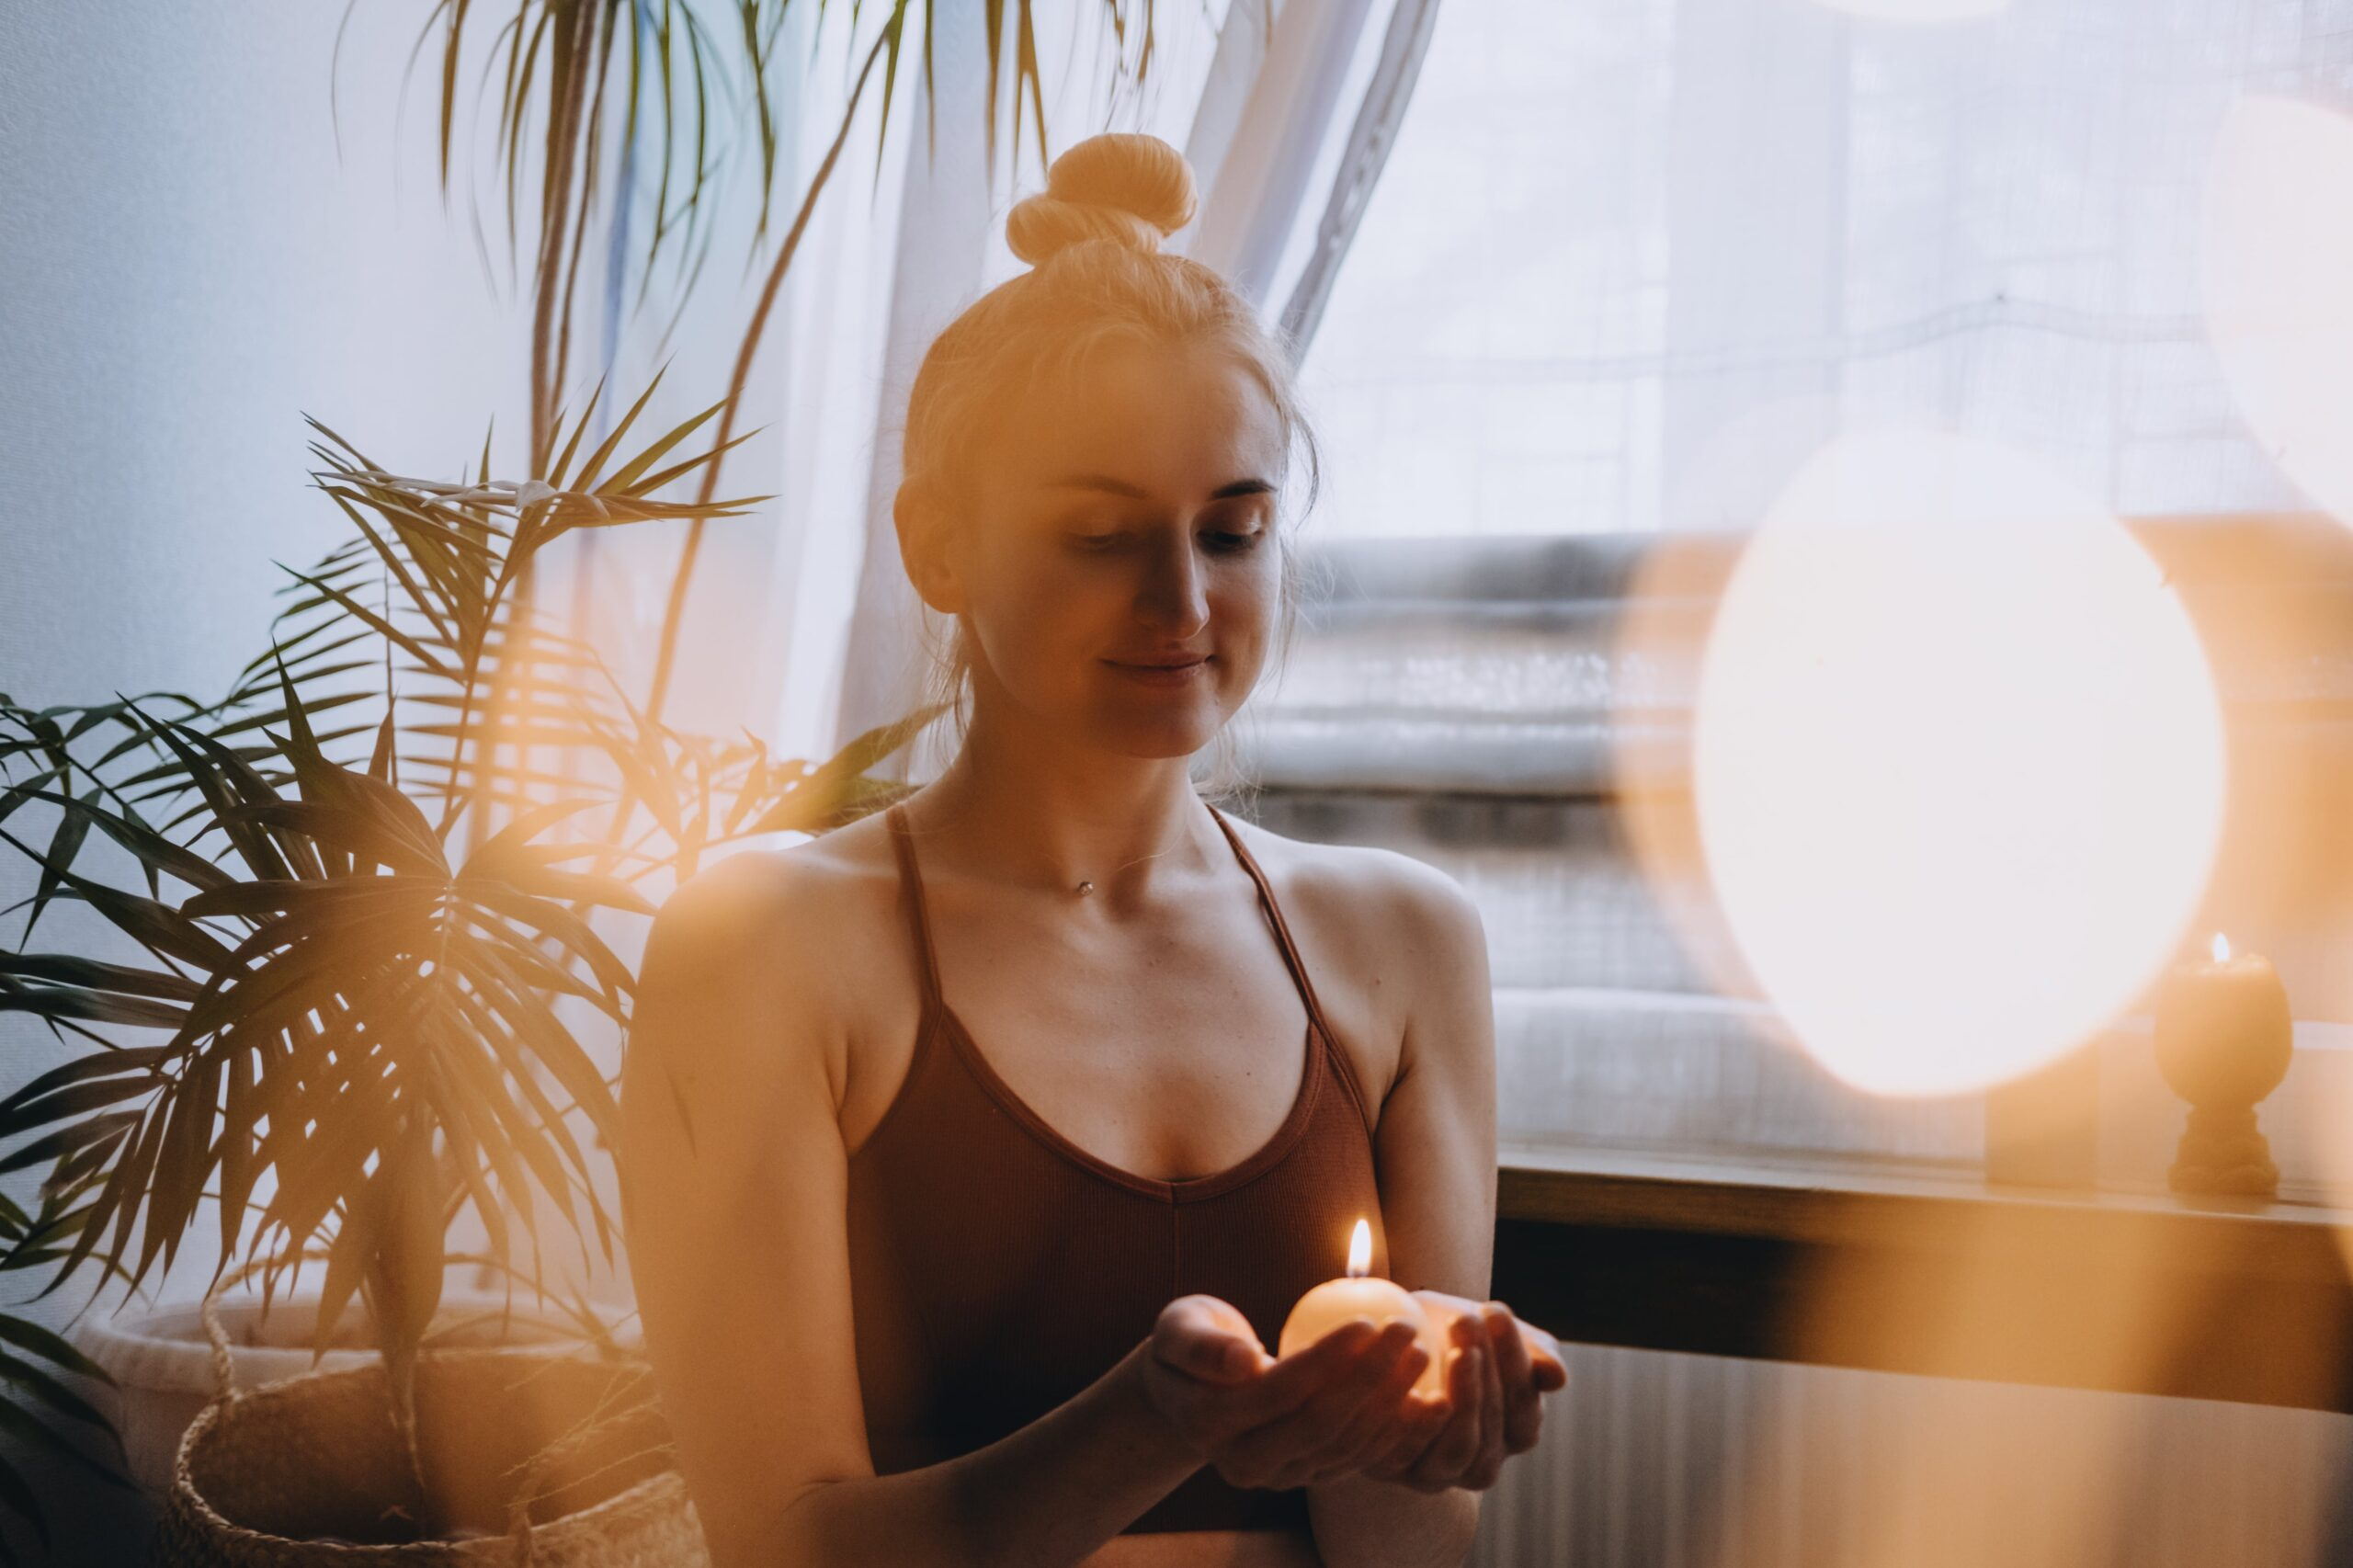 body compassion mindfulness positive body image